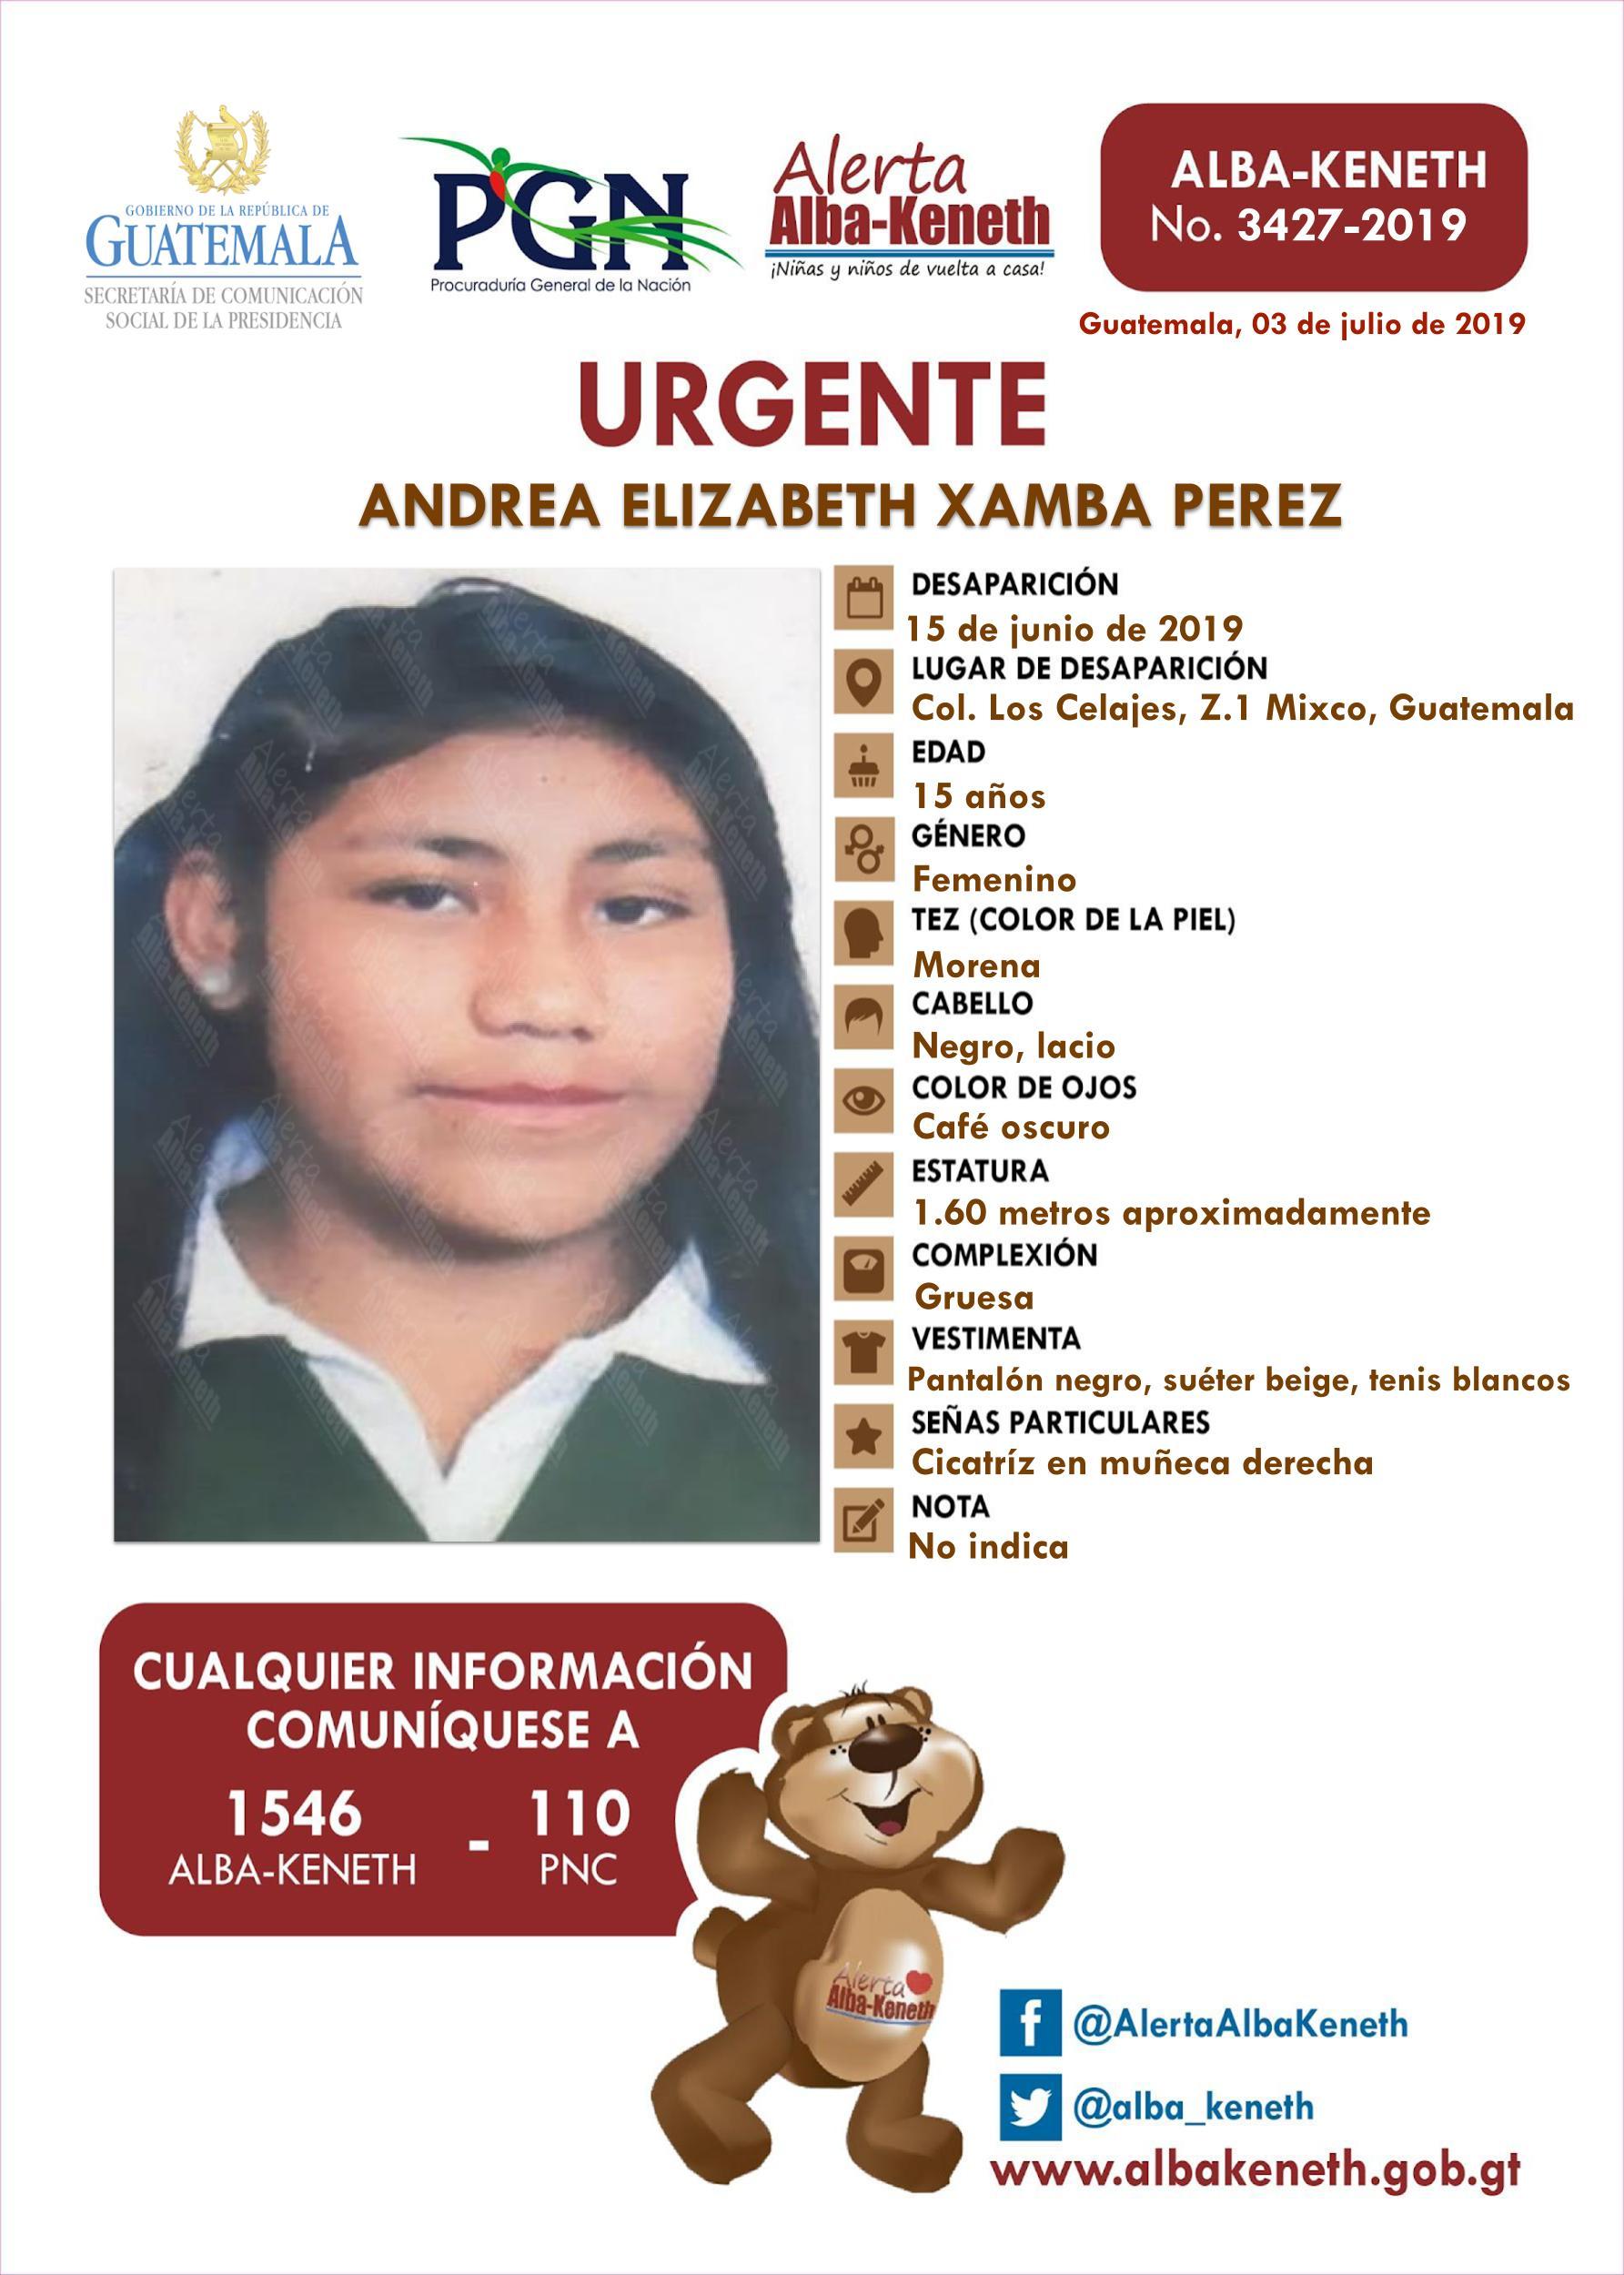 Andrea Elizabeth Xamba Perez